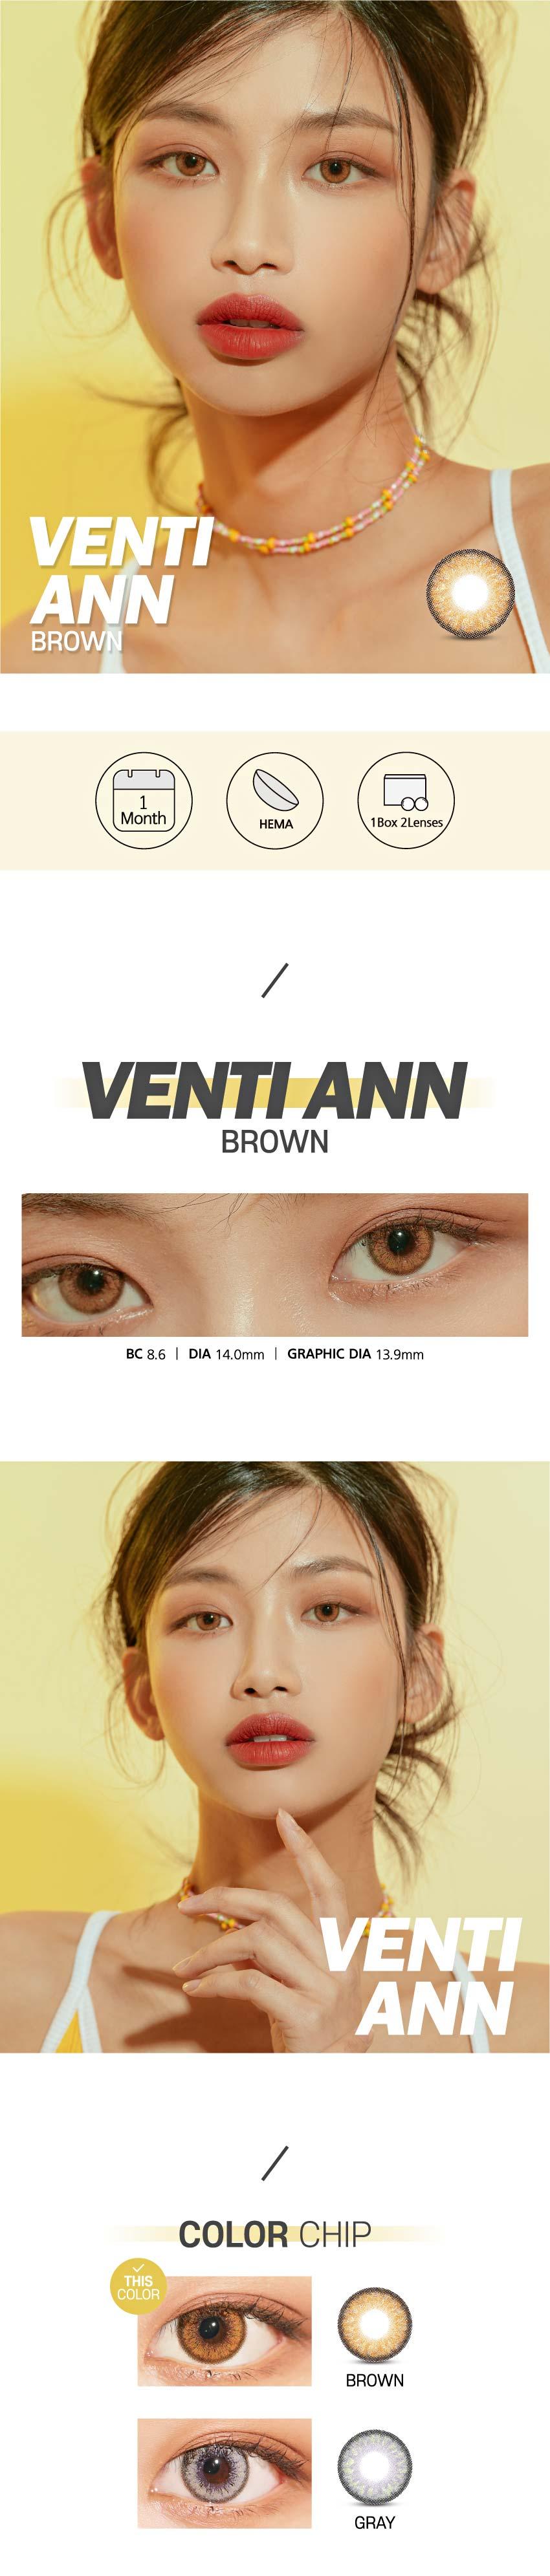 venti-ann-brownen-korean-colored-circle-contact-lenses1.jpg